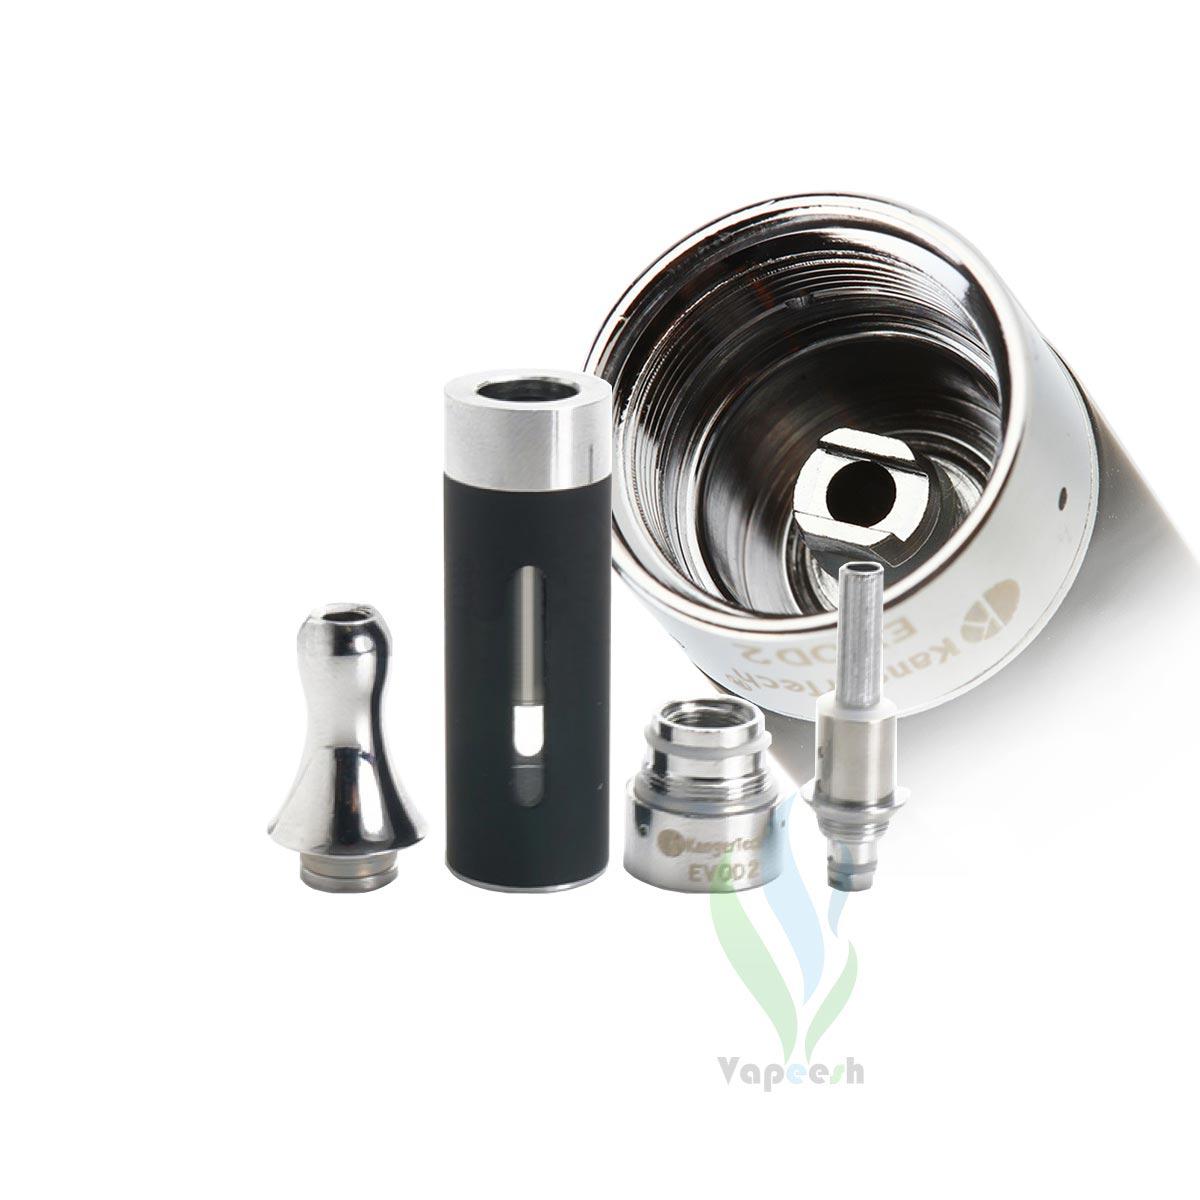 Kanger Evod2 Atomizer Components